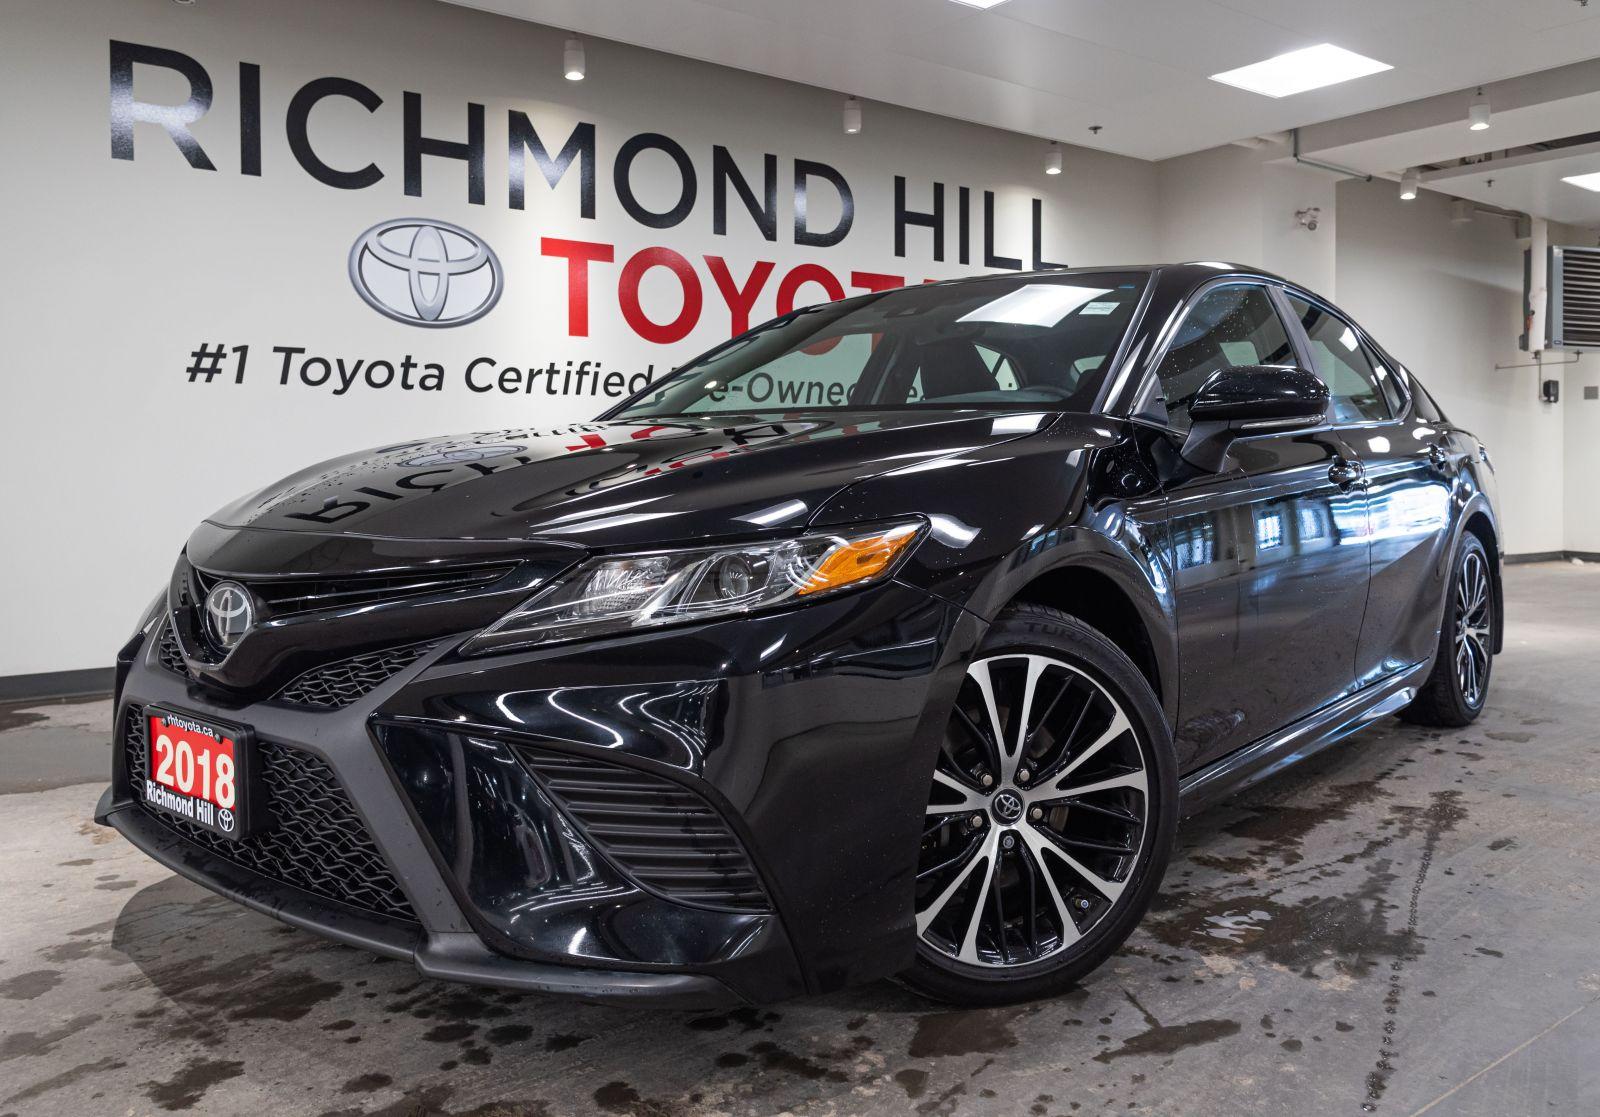 2018 Toyota Camry Image